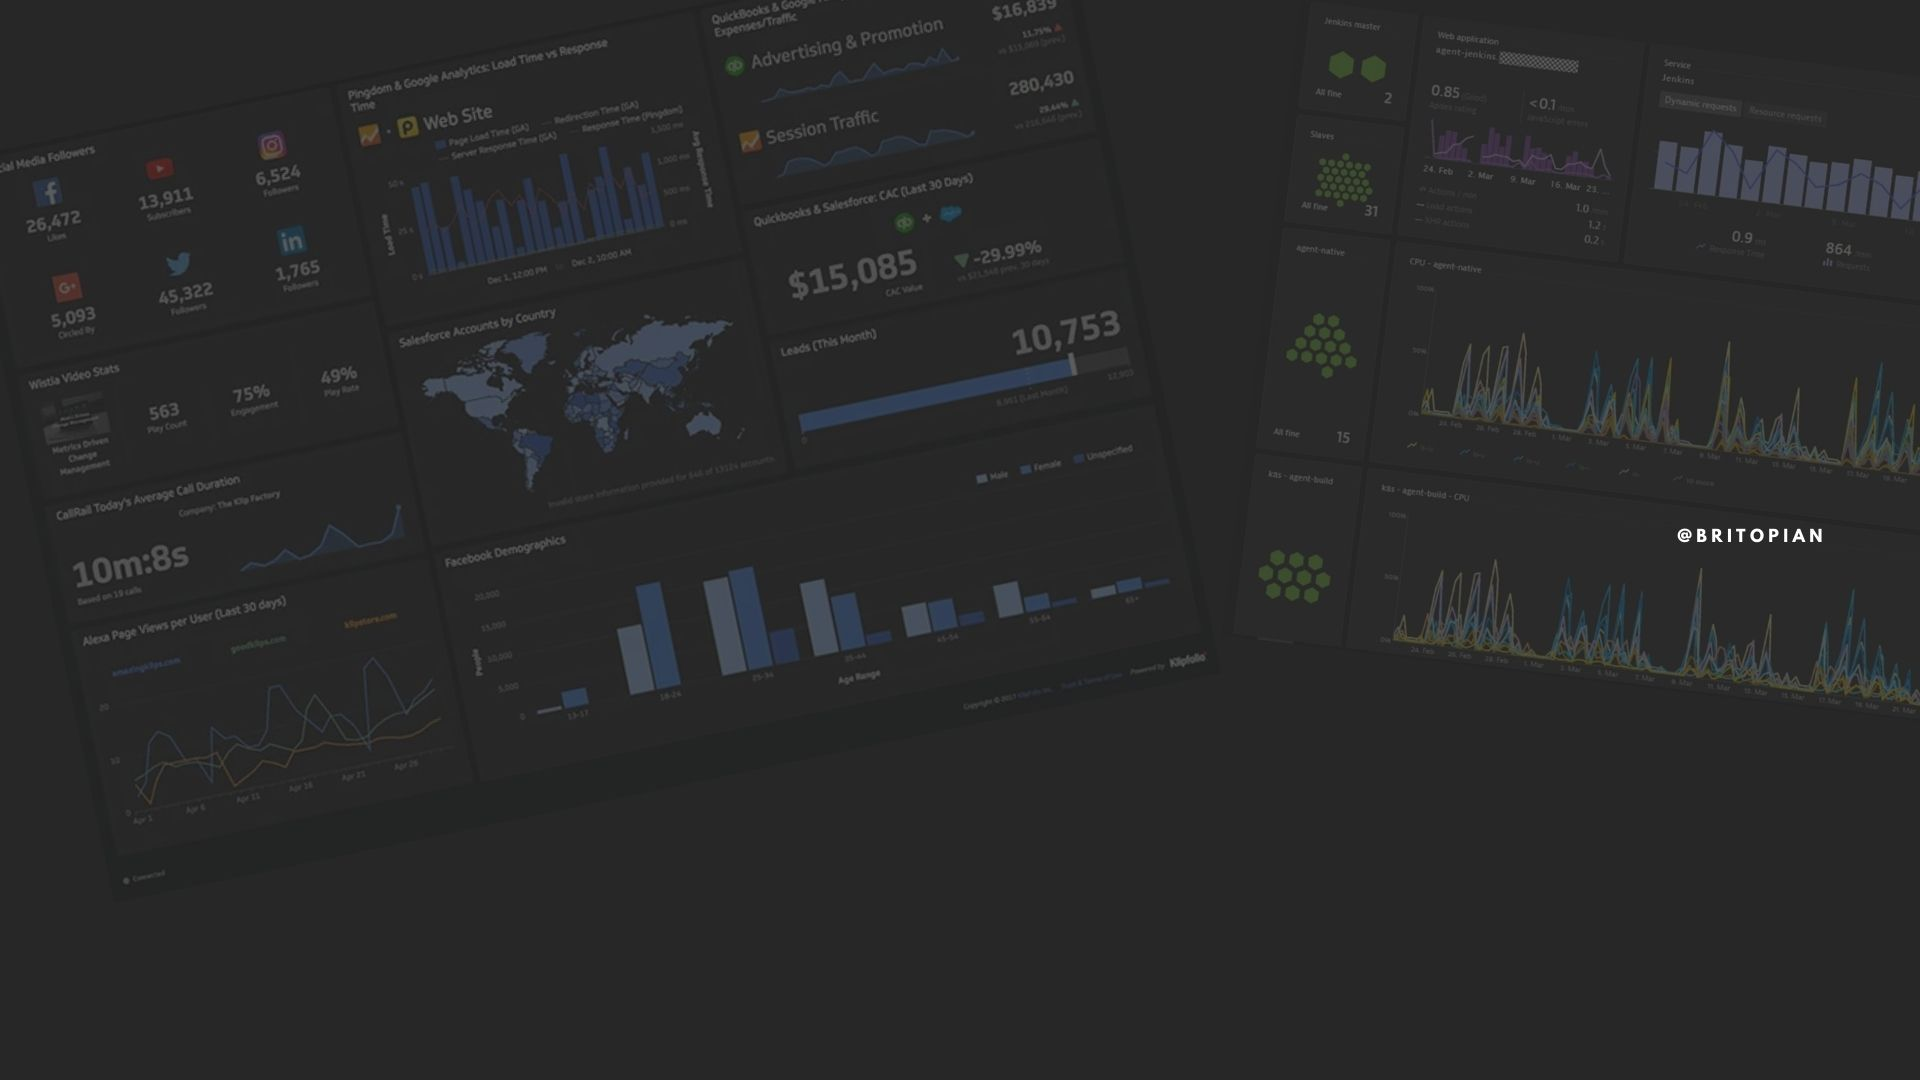 The Convergence of Social & Media Monitoring Software Tools